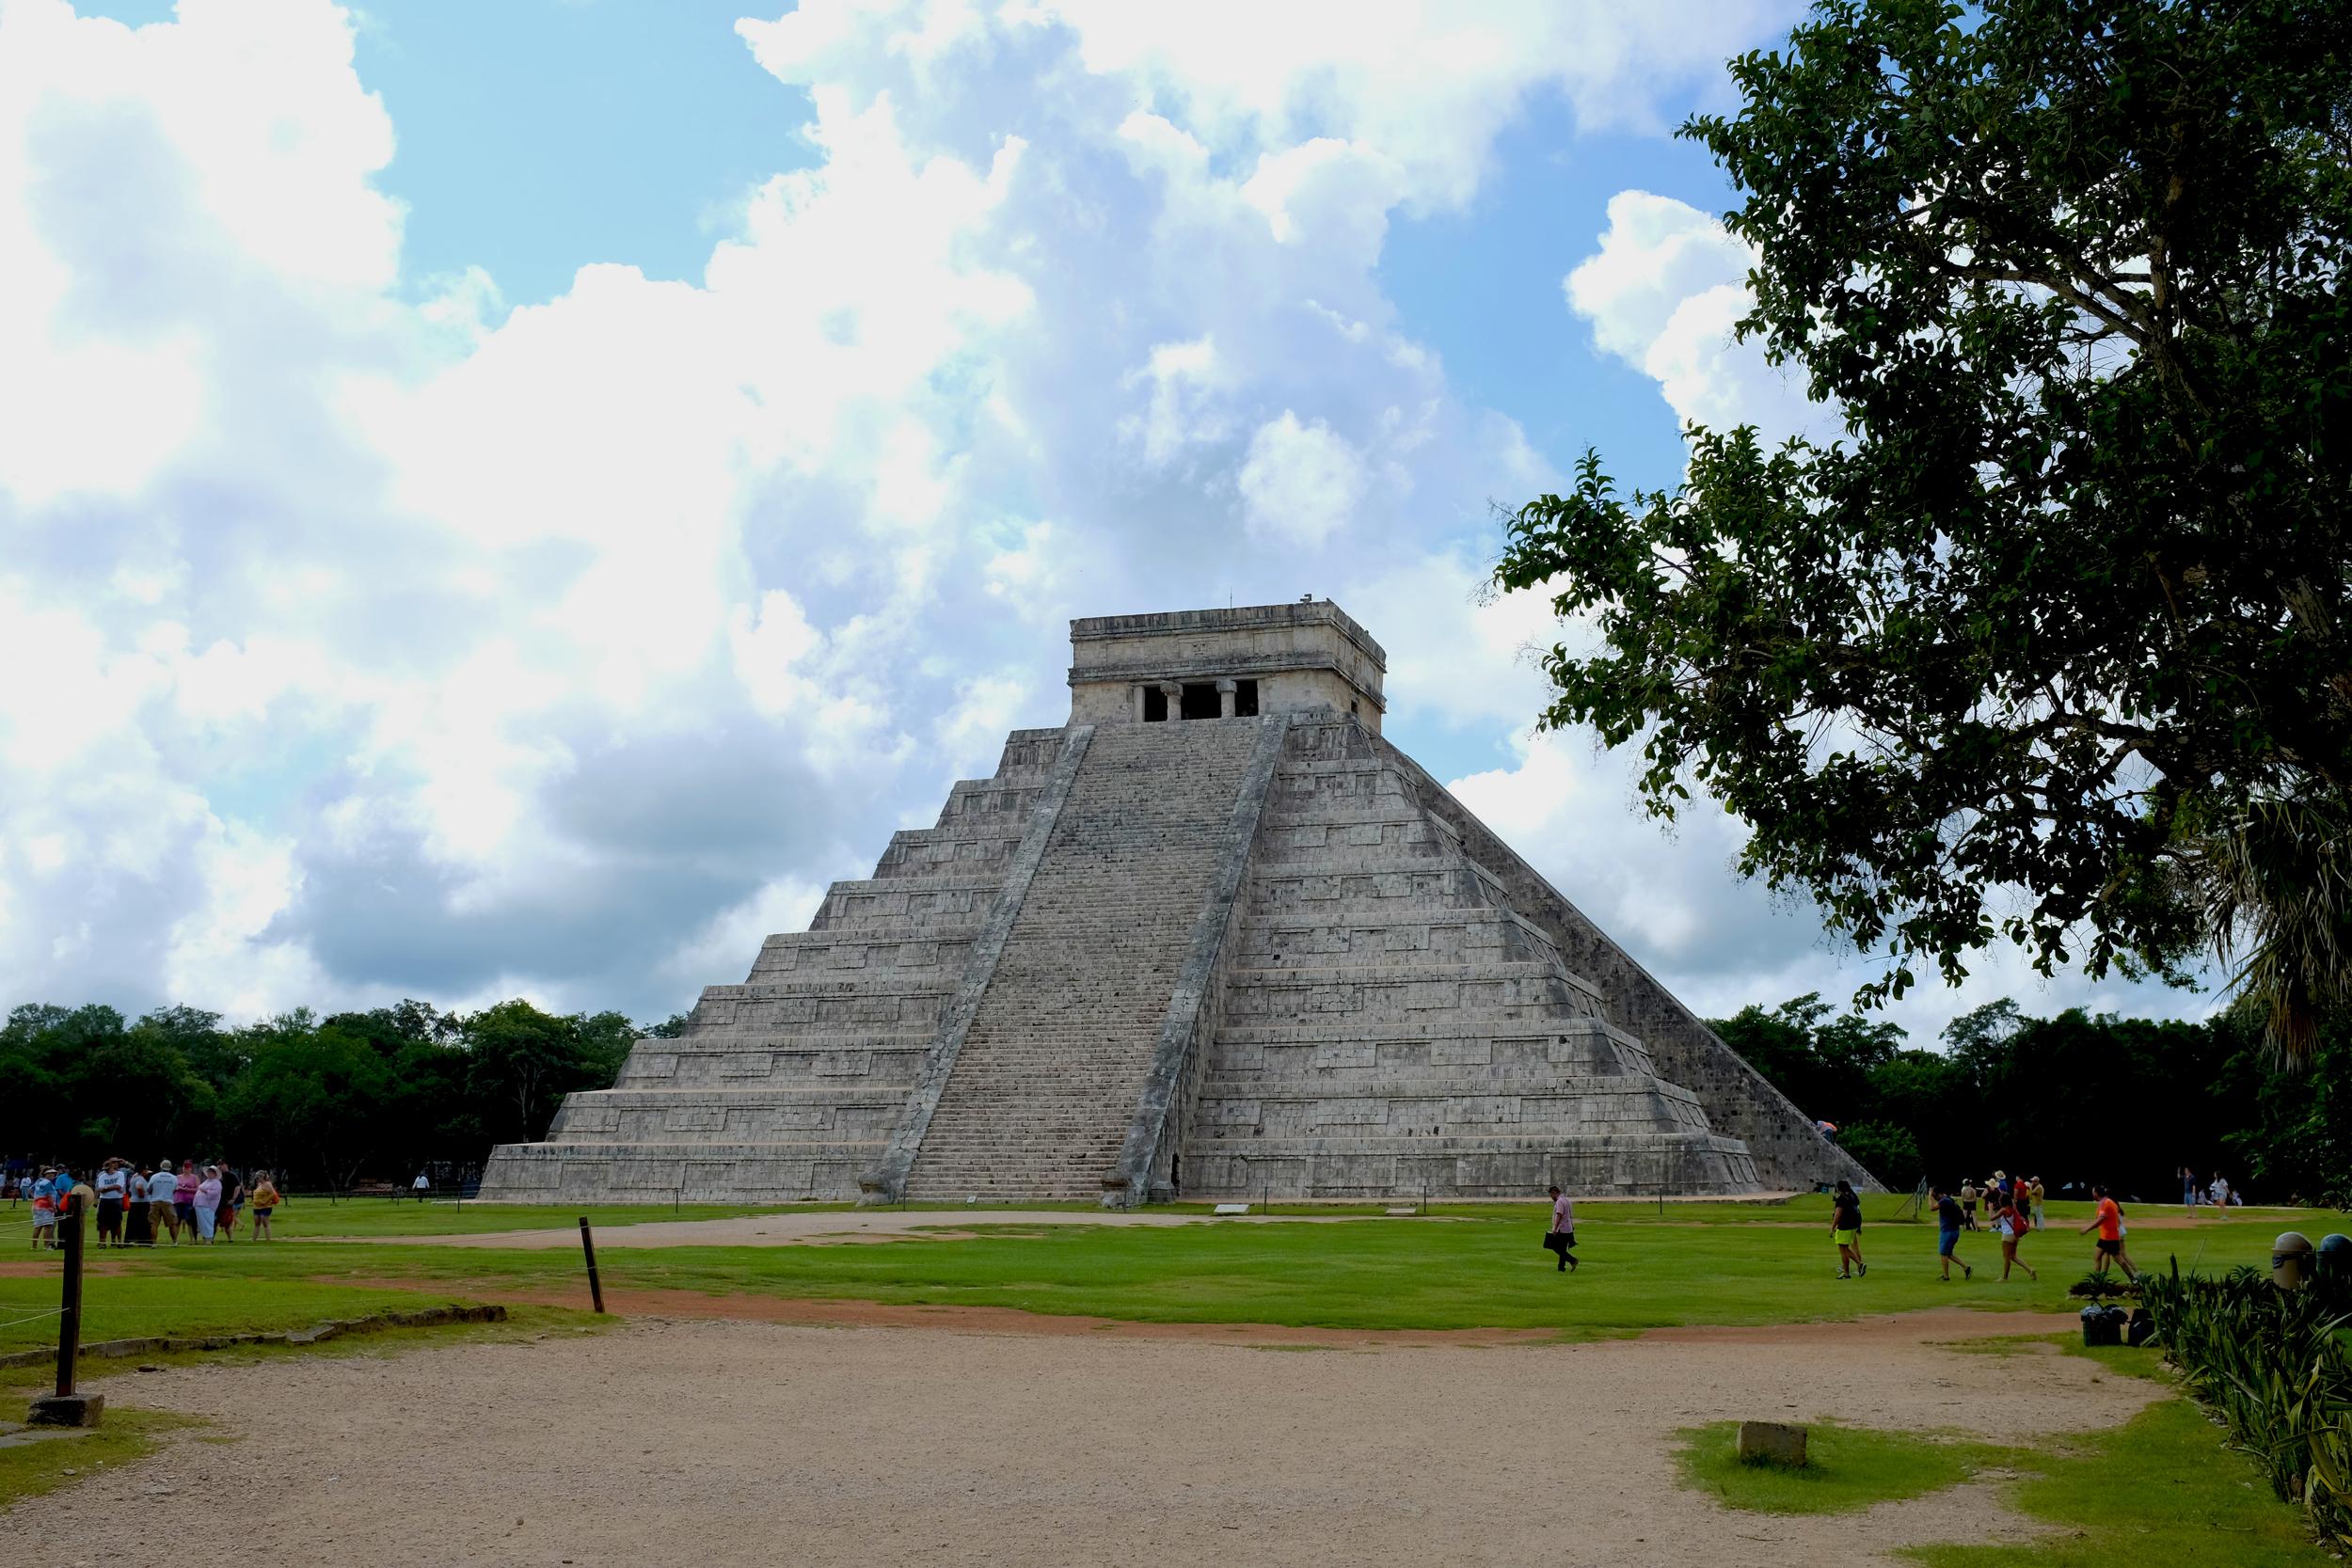 Chichén Itzá / Mexico